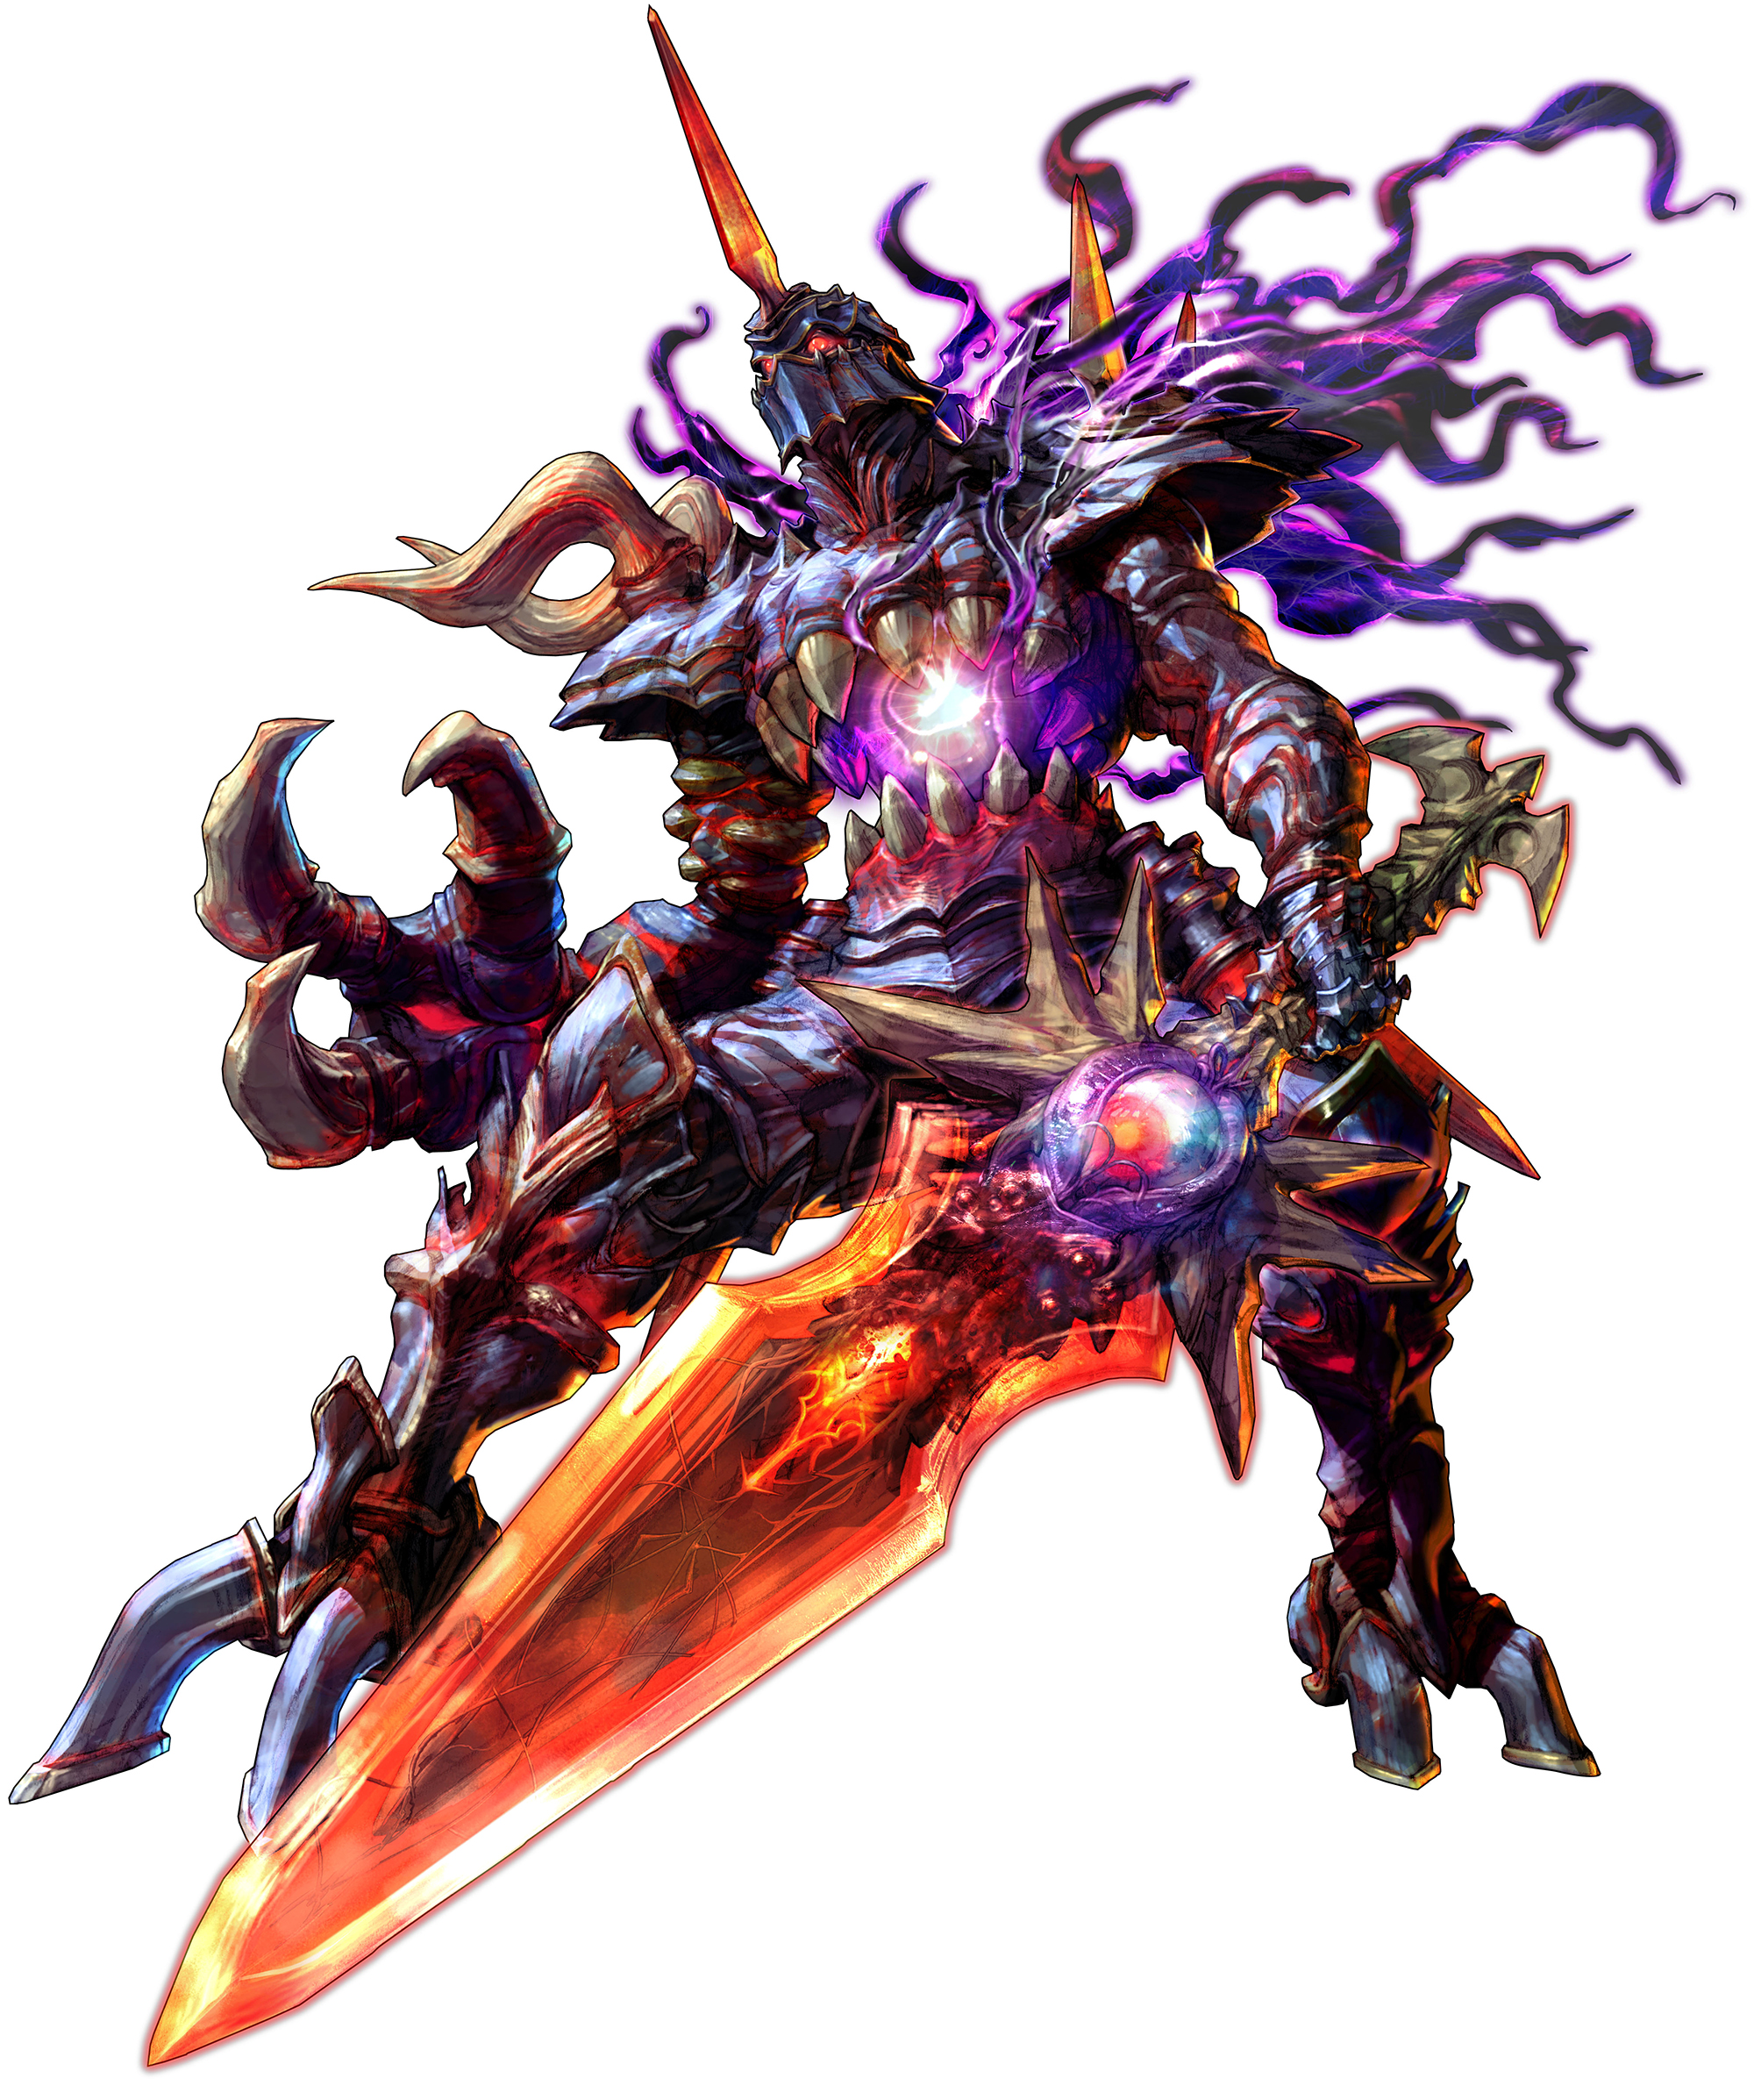 Soul Calibur 5 Characters List (PS3, Xbox 360)